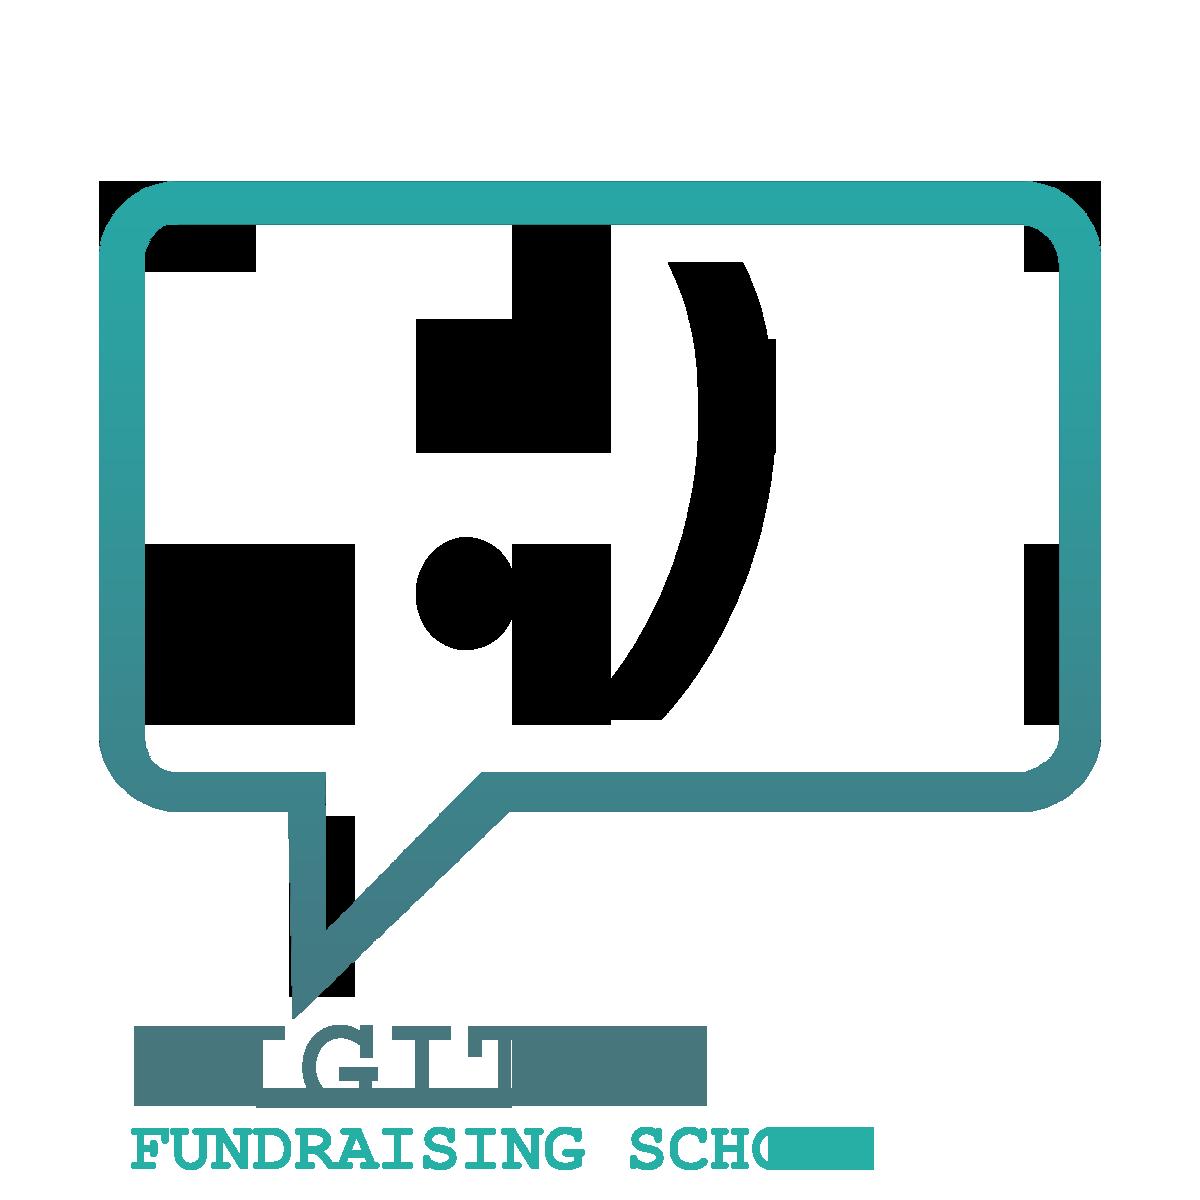 Crowdfunding Quickstart from Digital Fundraising School